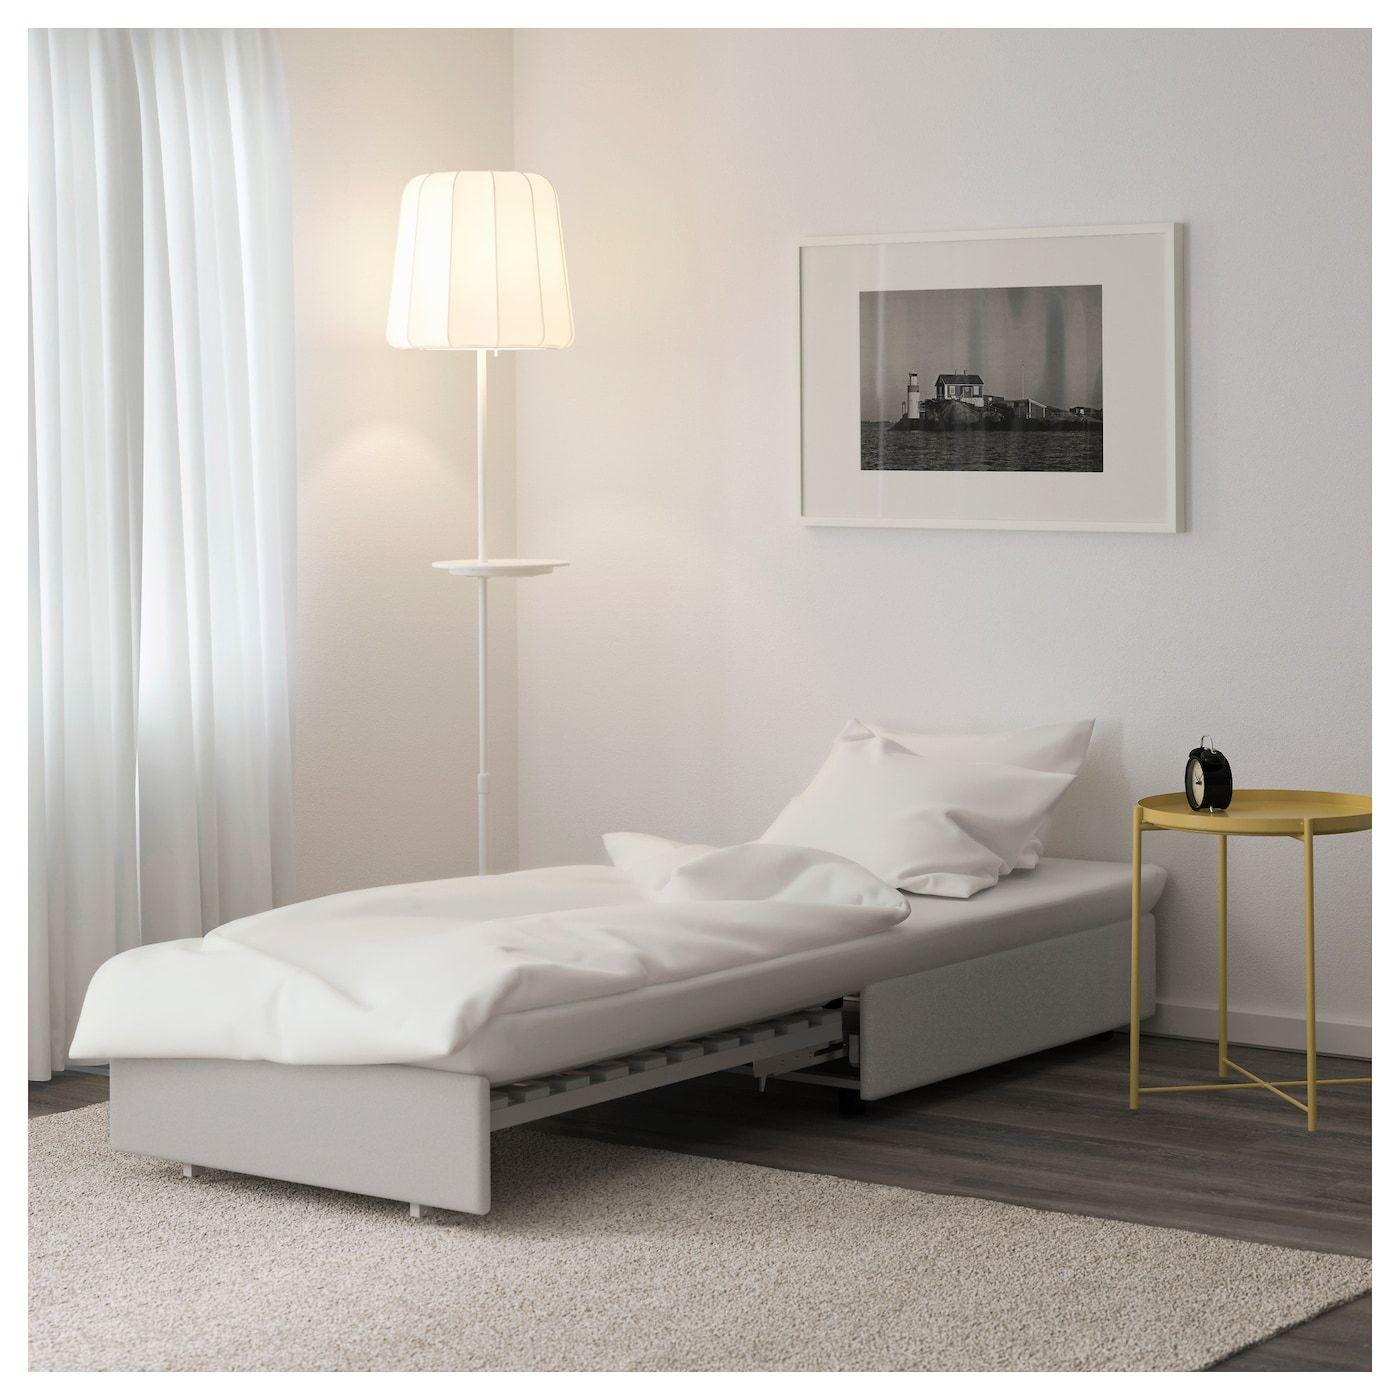 sleeper module vallentuna orrsta light gray in 2019 scituate house rh pinterest com